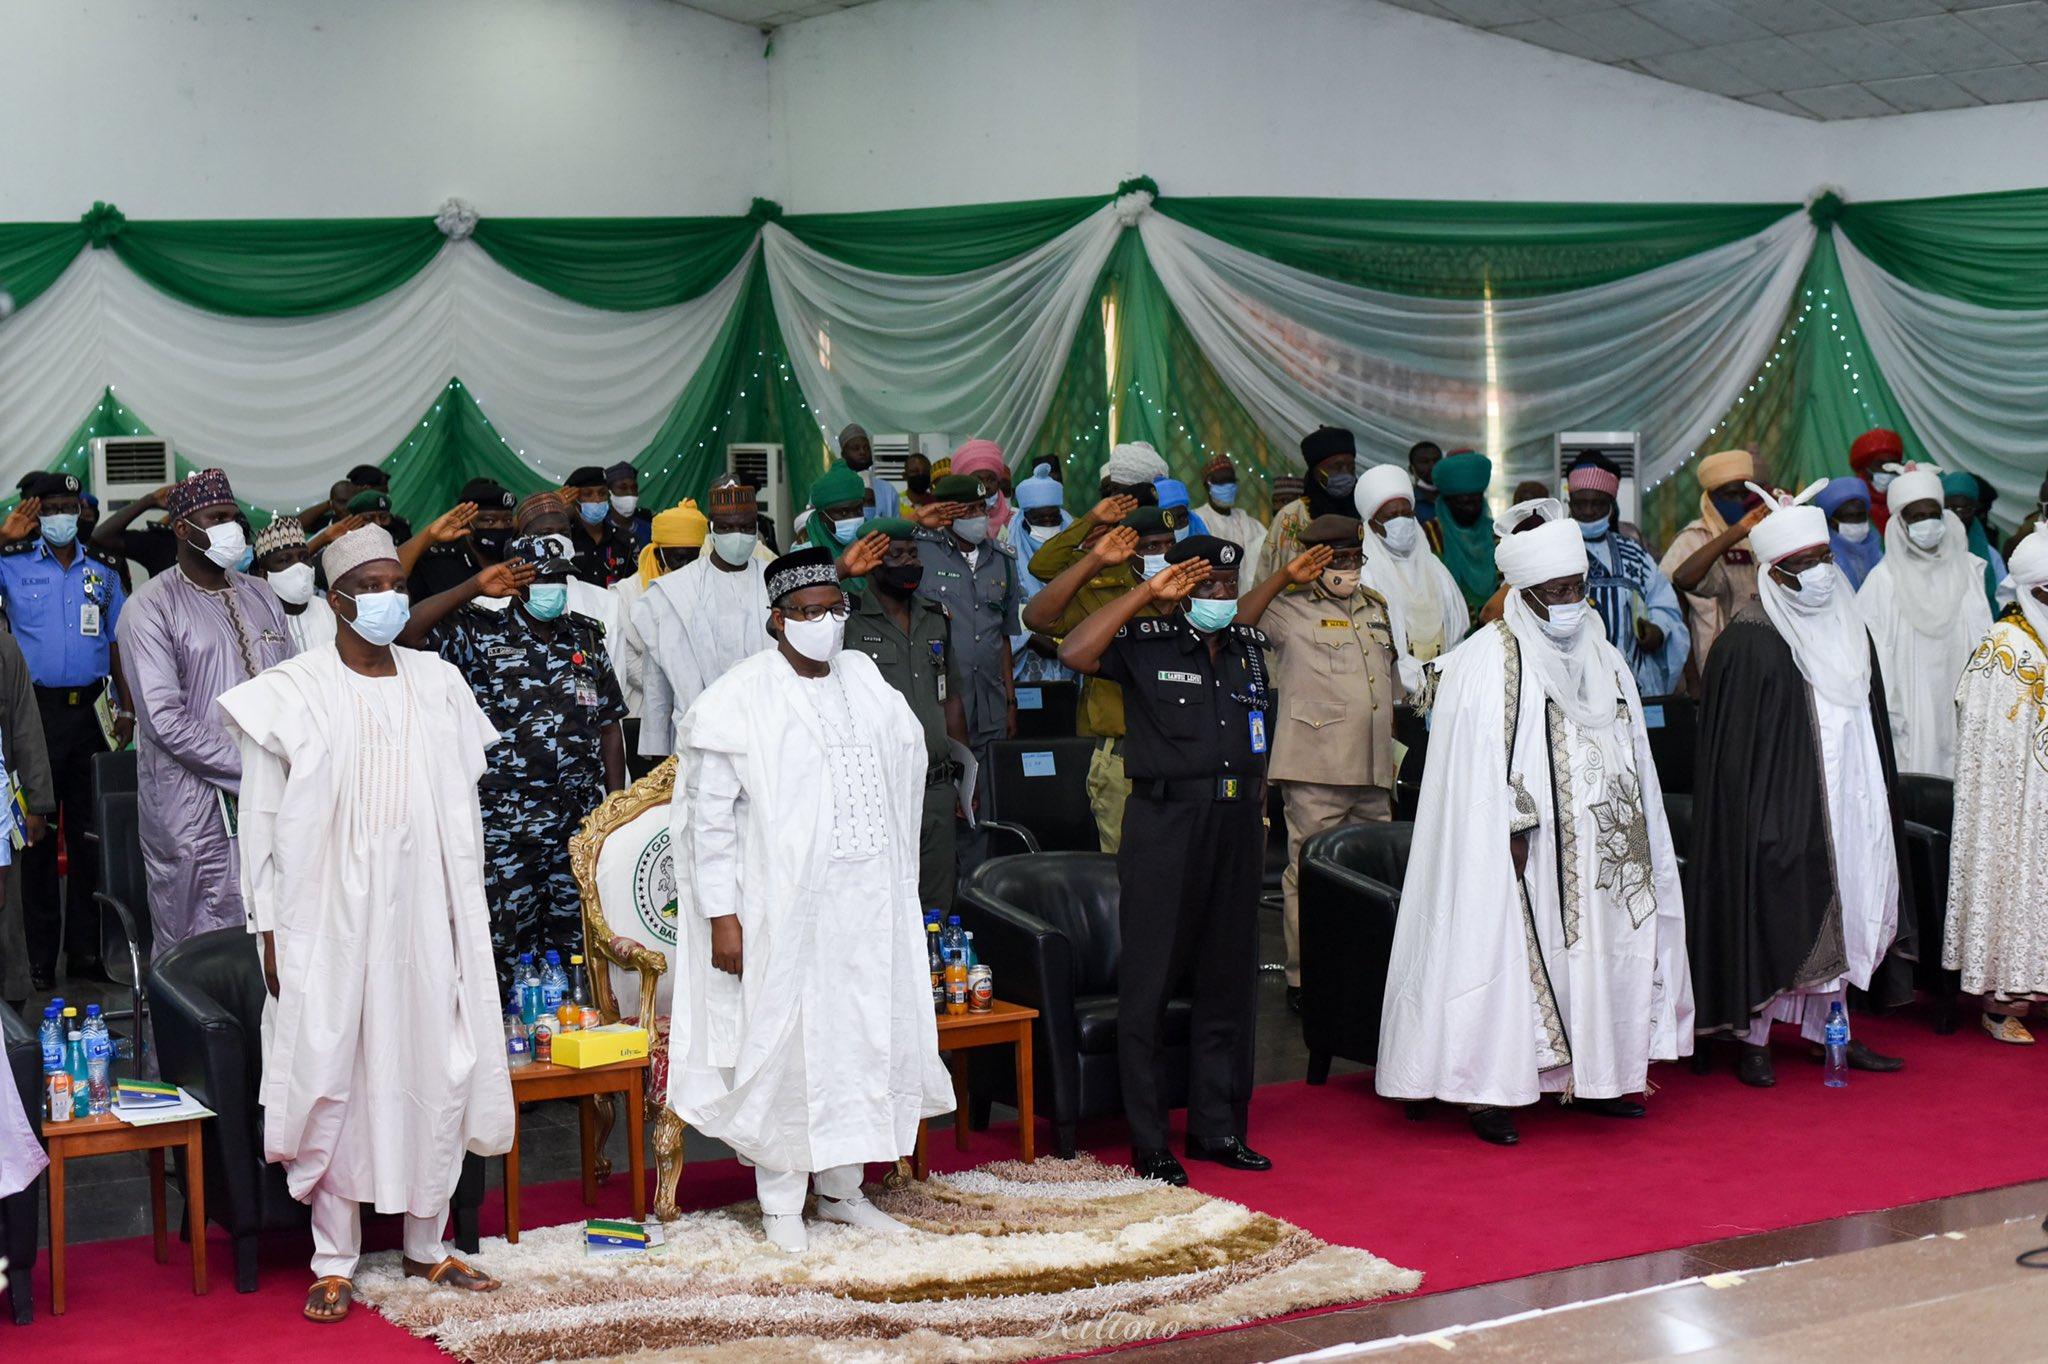 Bala Mohammed inaugurated a 21-member advisory committee on community policing [PHOTO CREDIT: @SenBalaMohammed]